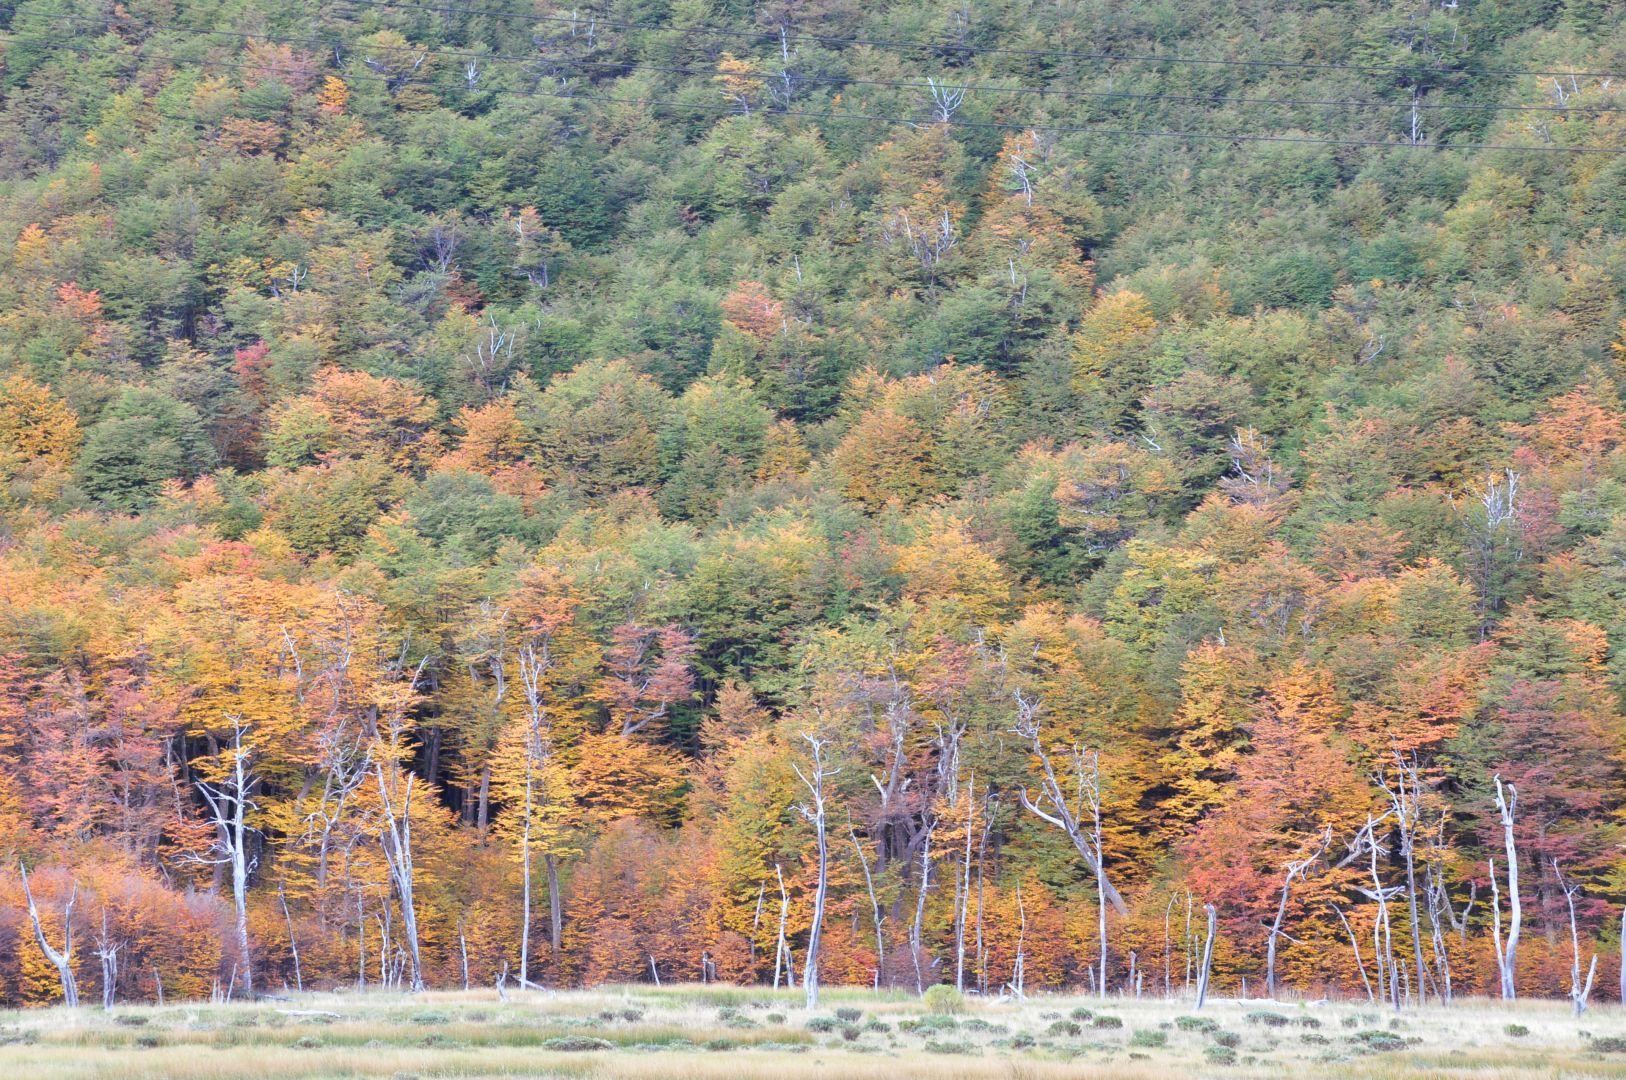 bosque canbiando su color